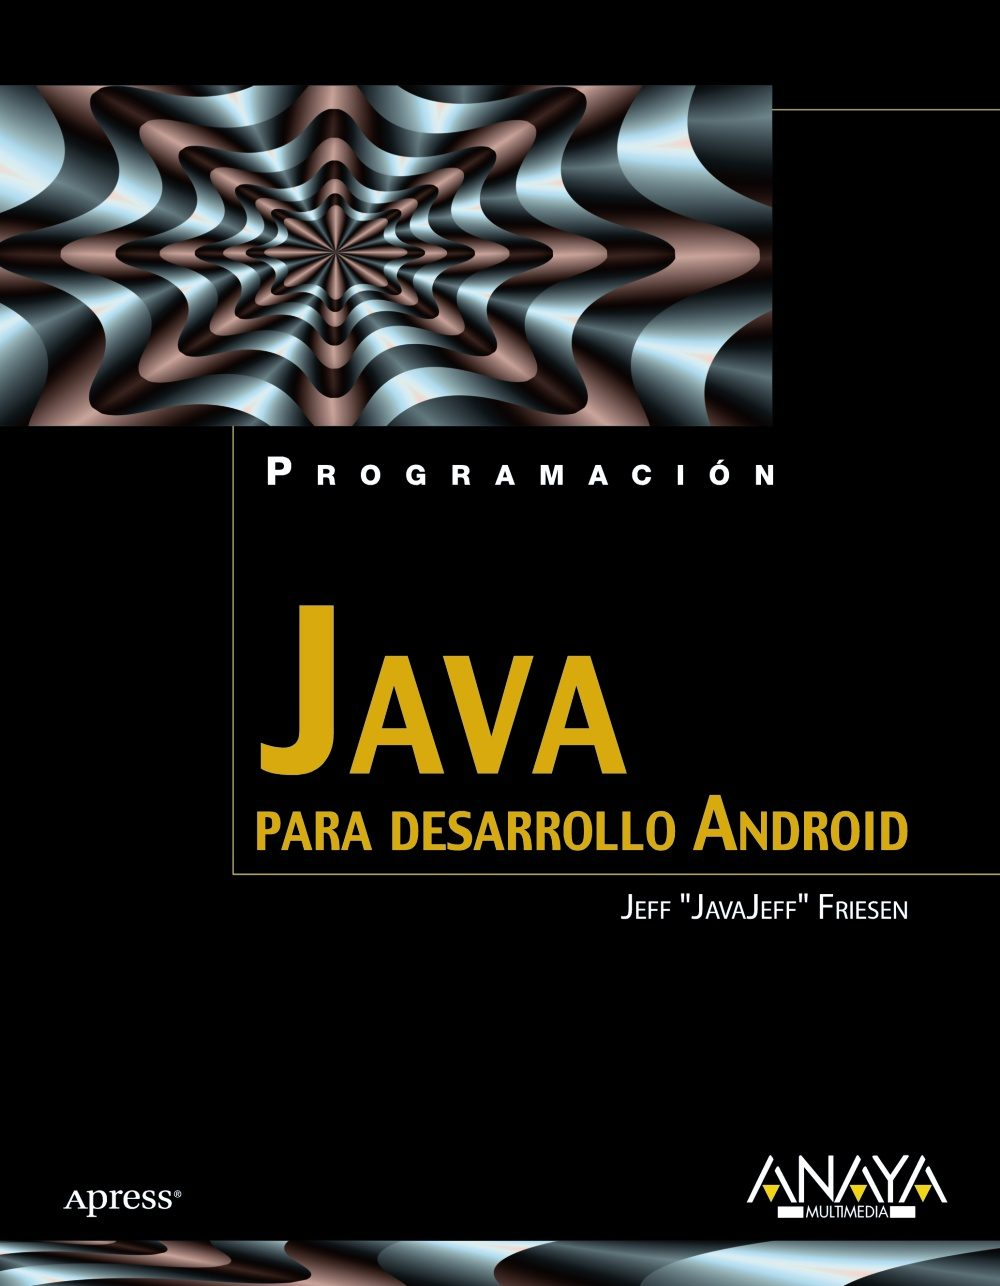 java para desarrollo android (programacion)-jeff friesen-9788441529618